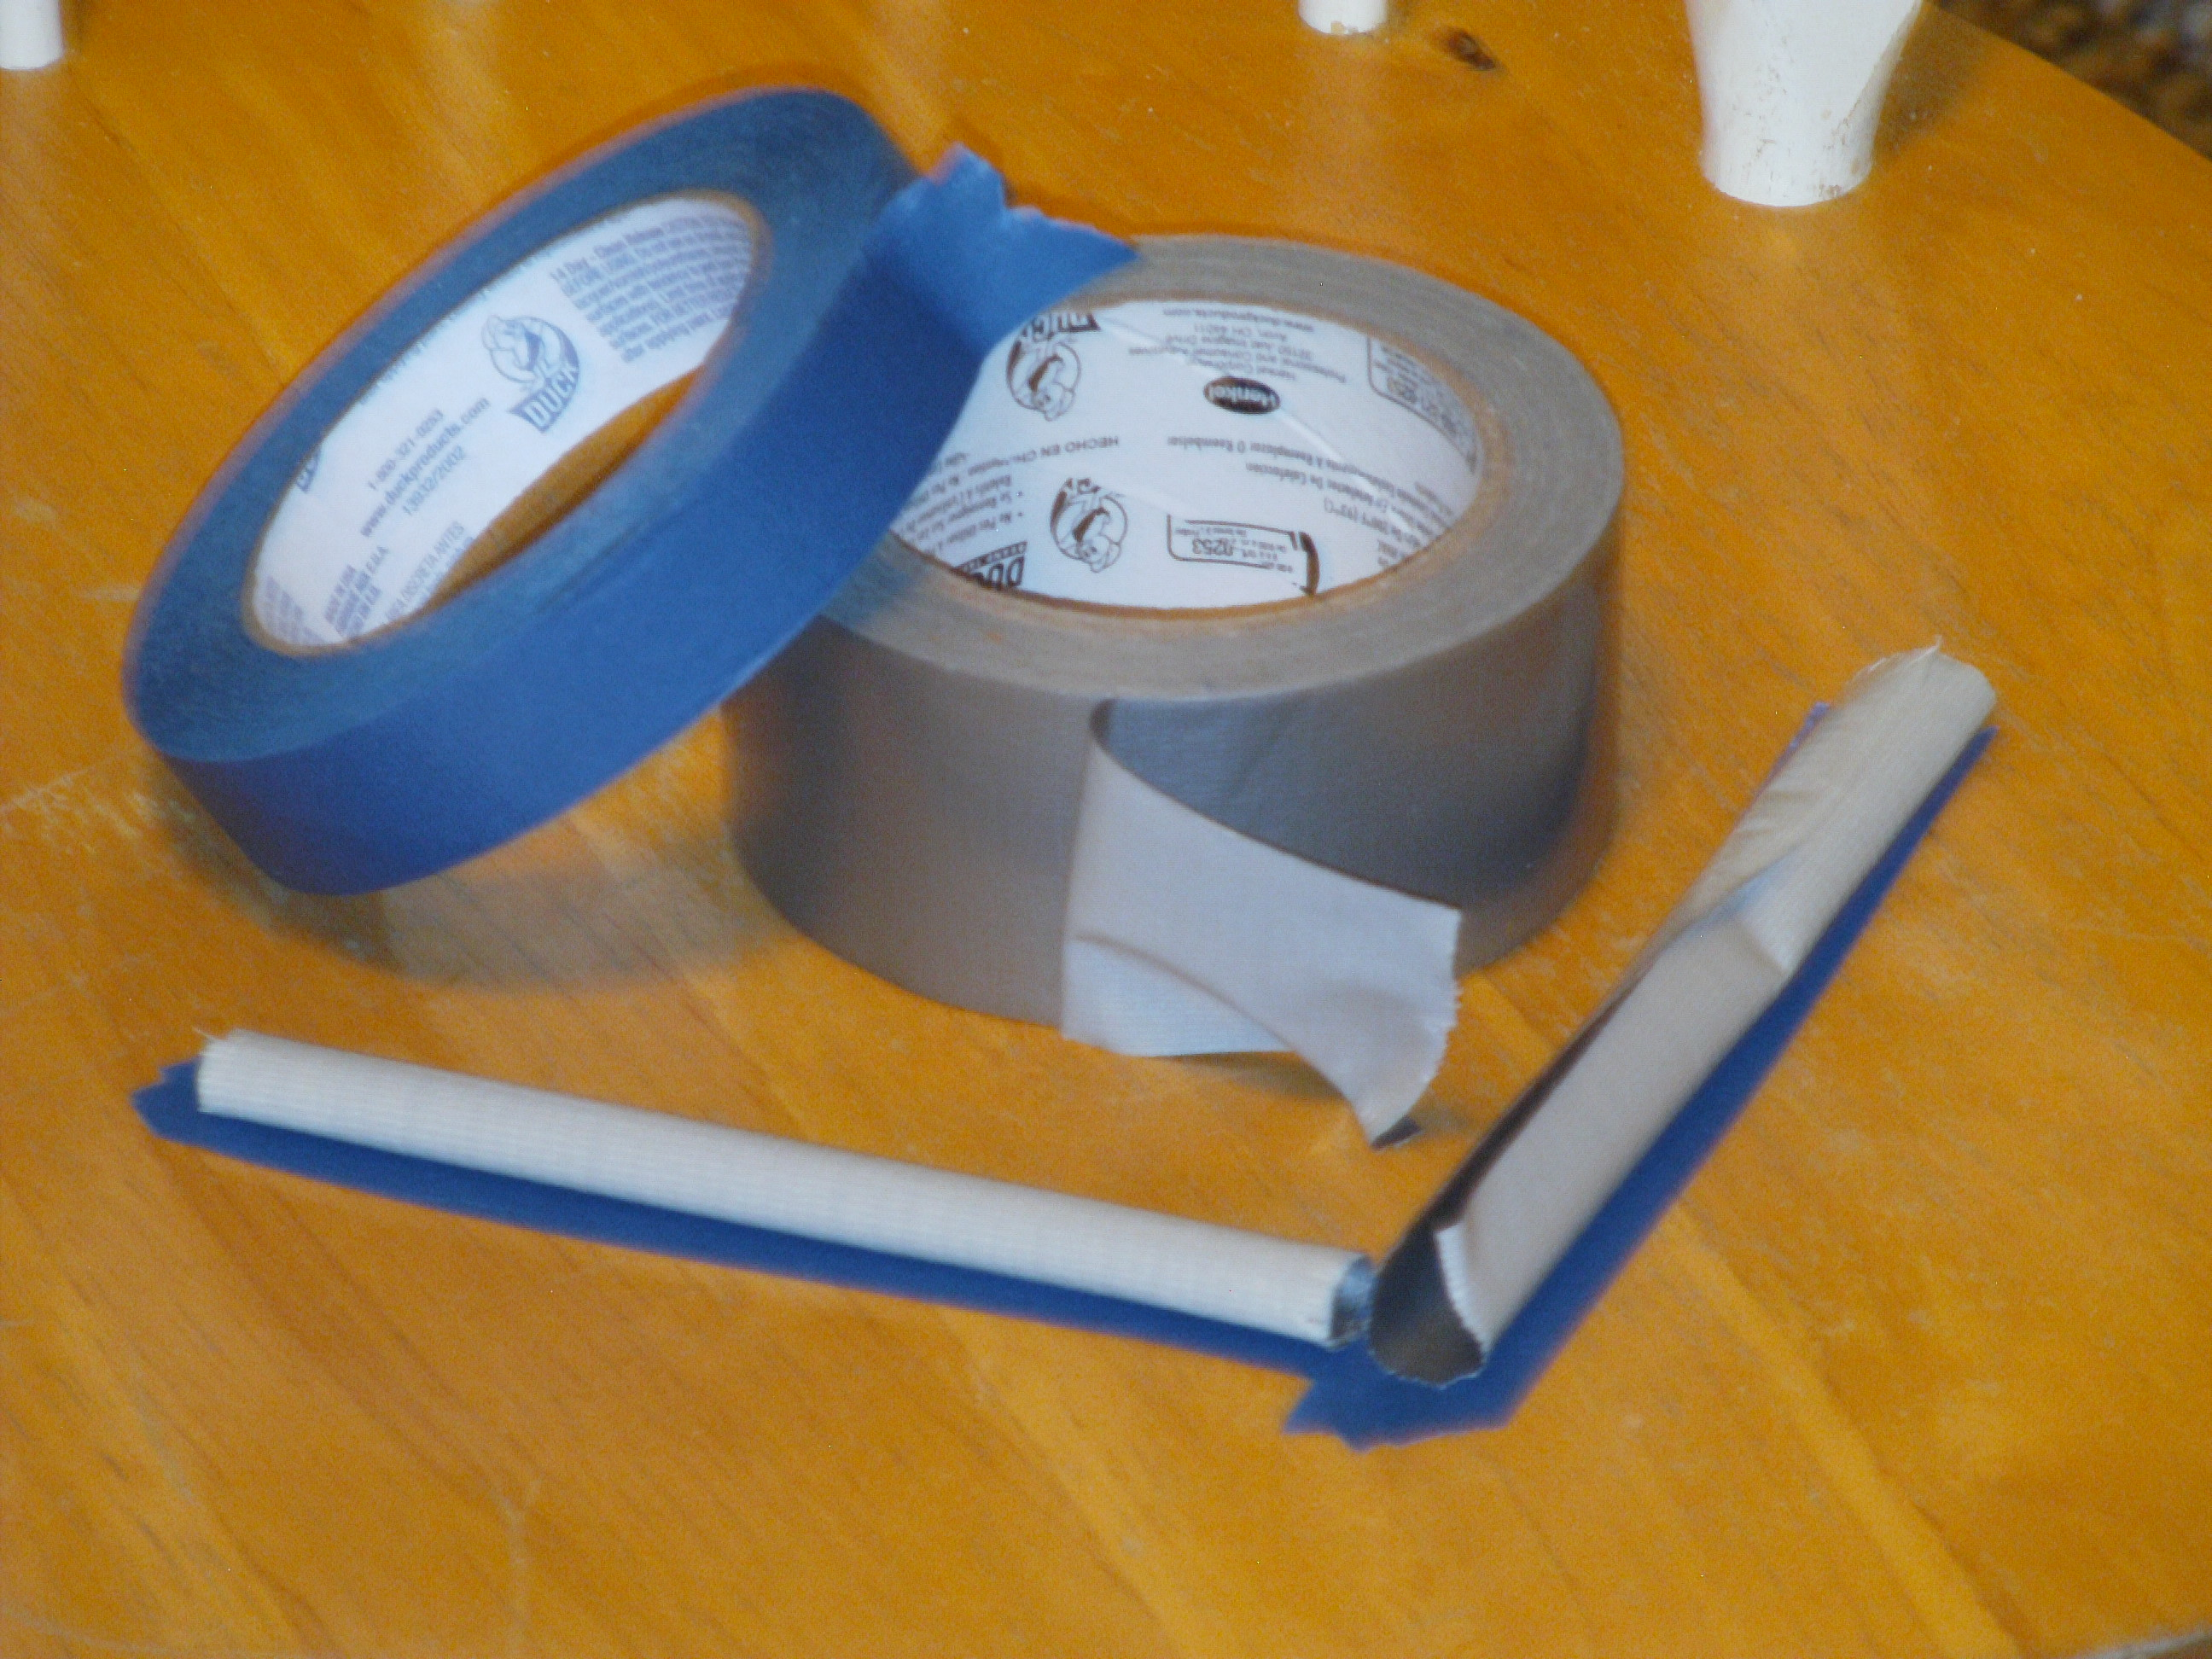 File:Bed Bug Barrier Curled Duct Tape Over Masking Tape.JPG